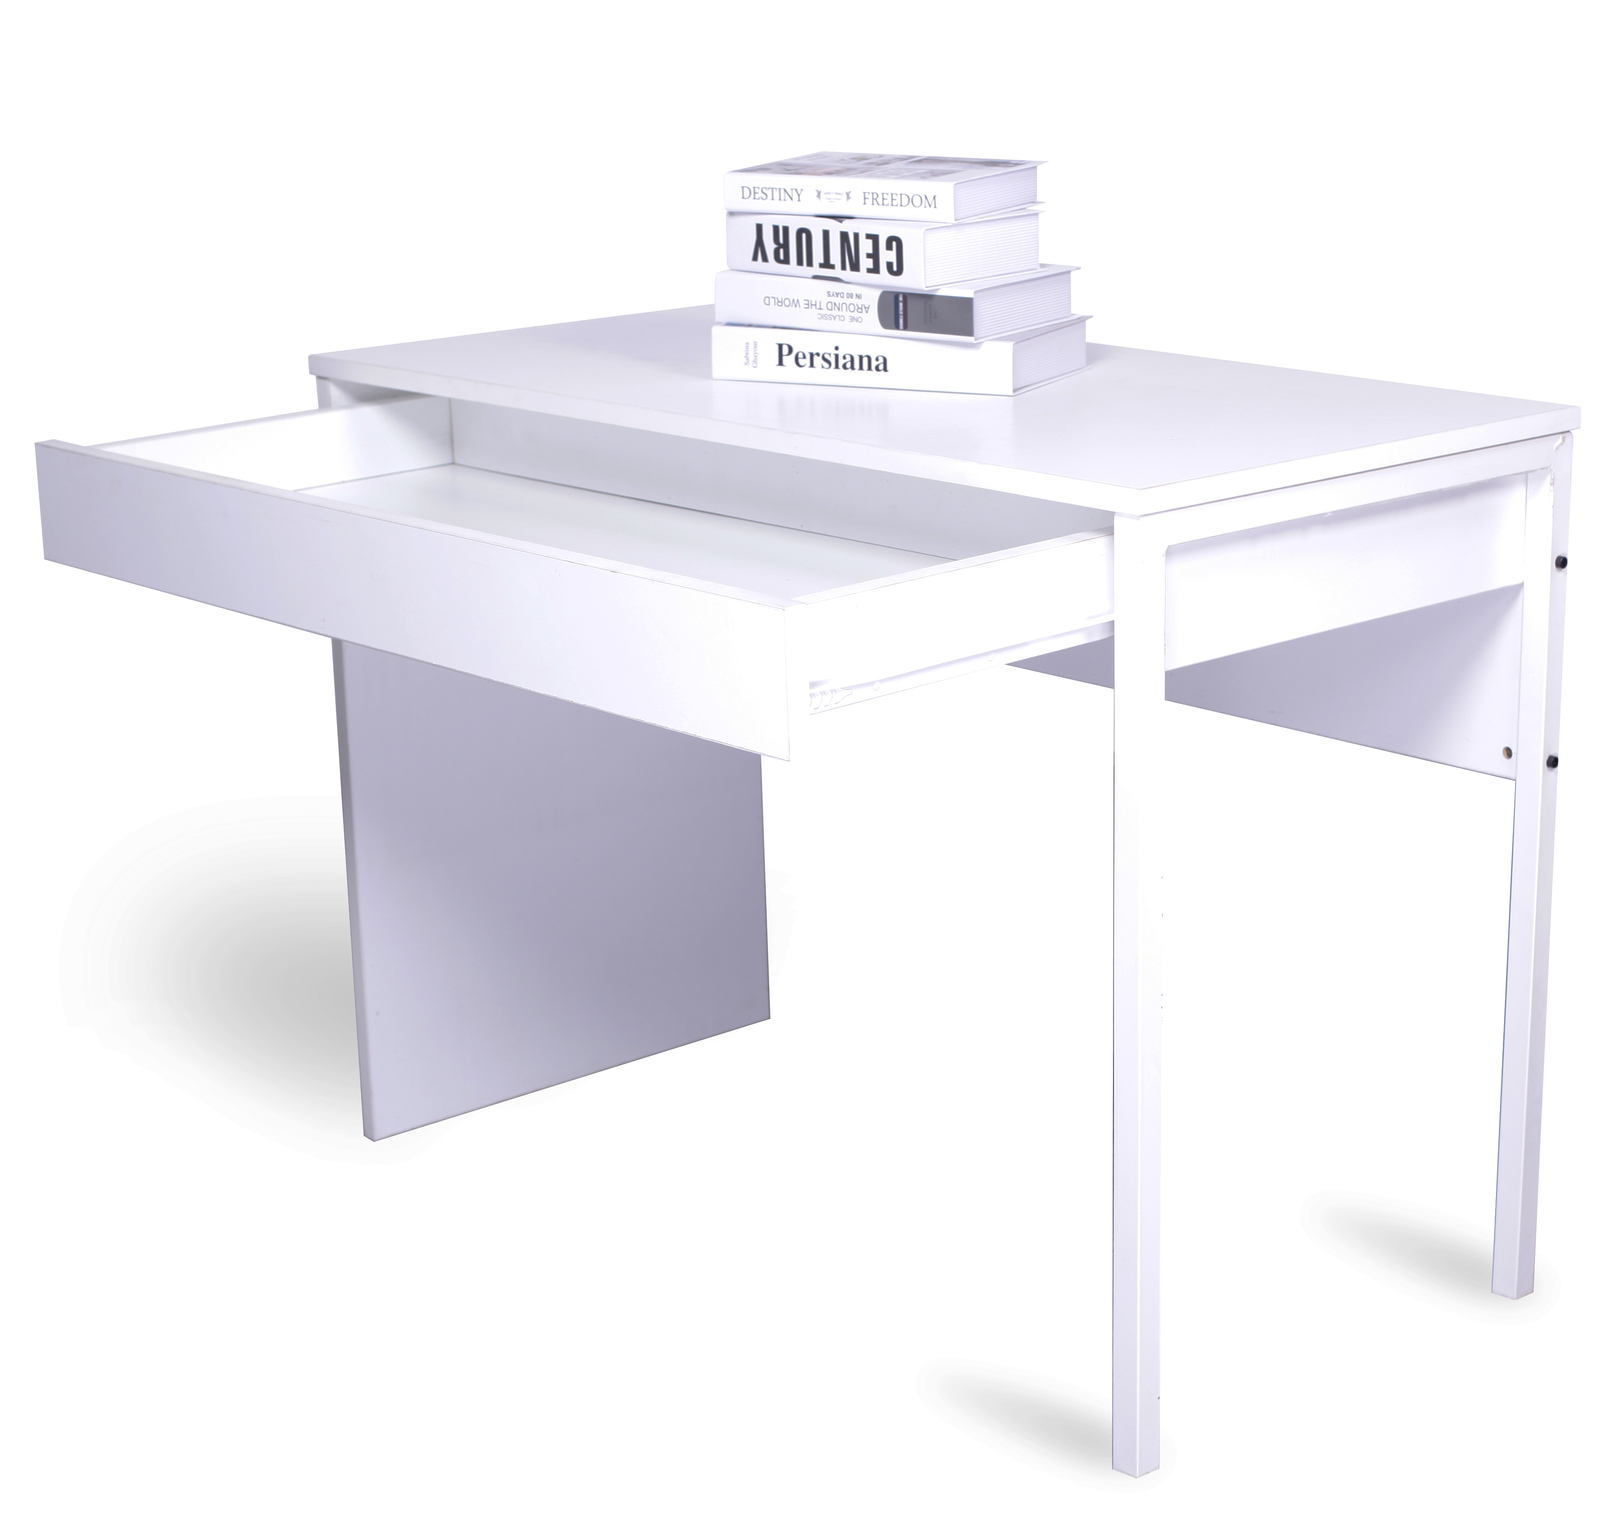 Gorilla Office: Study Desk (White) image